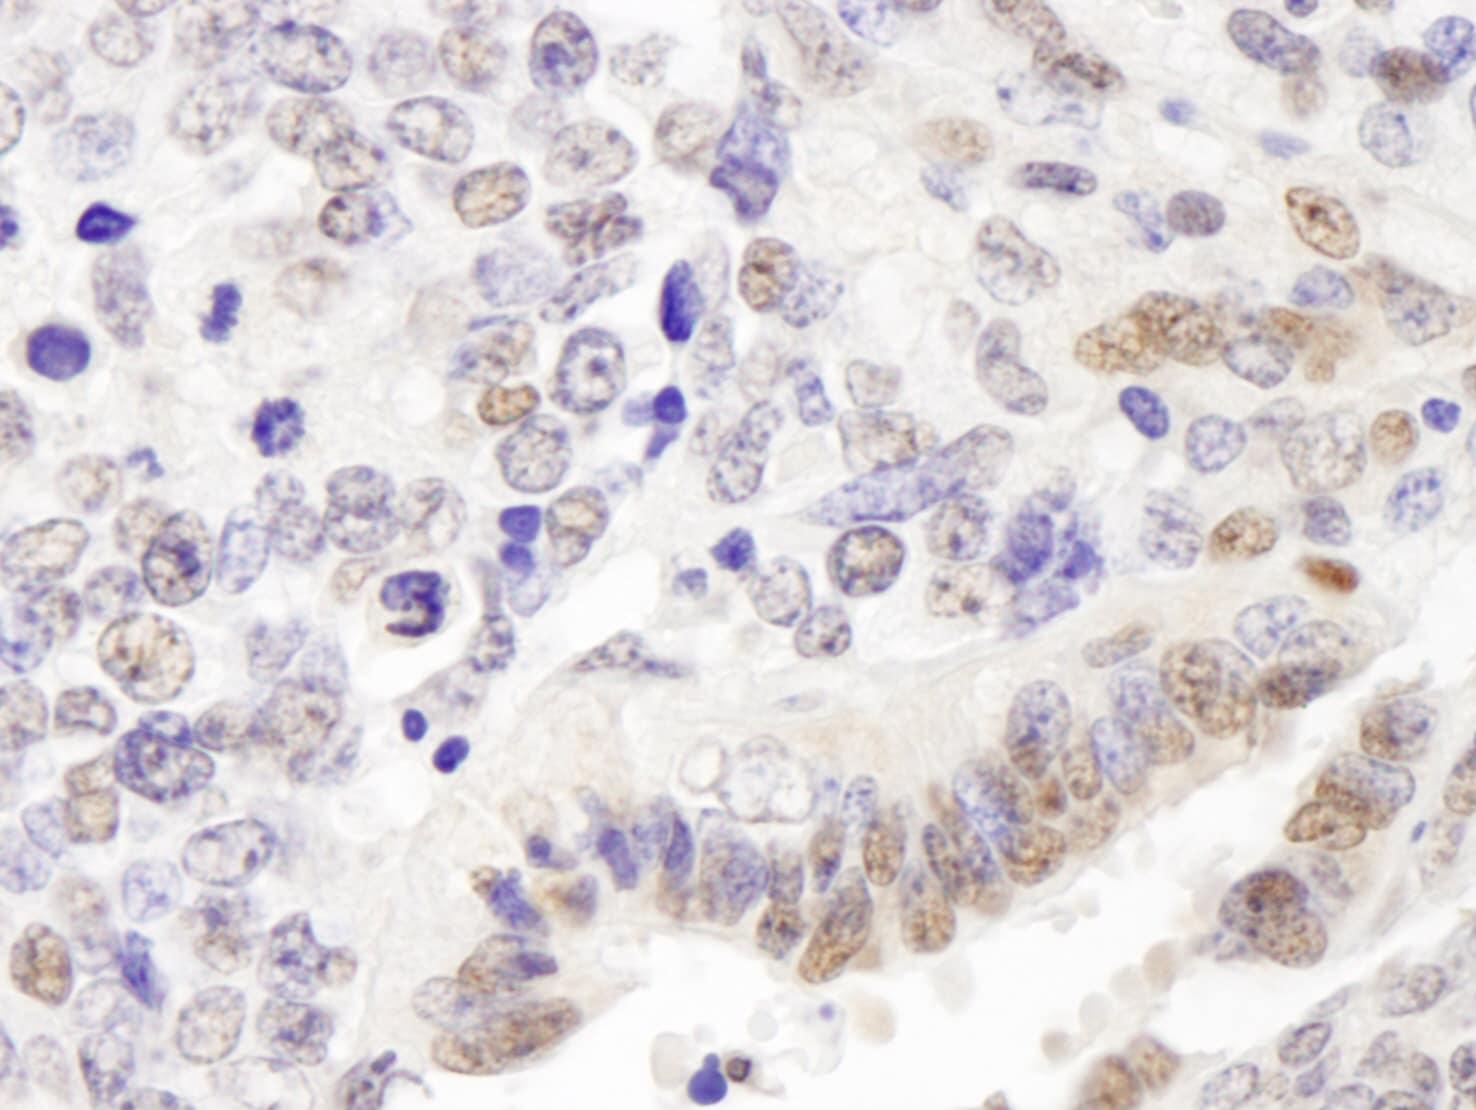 p66alpha Antibody in Immunohistochemistry (IHC)